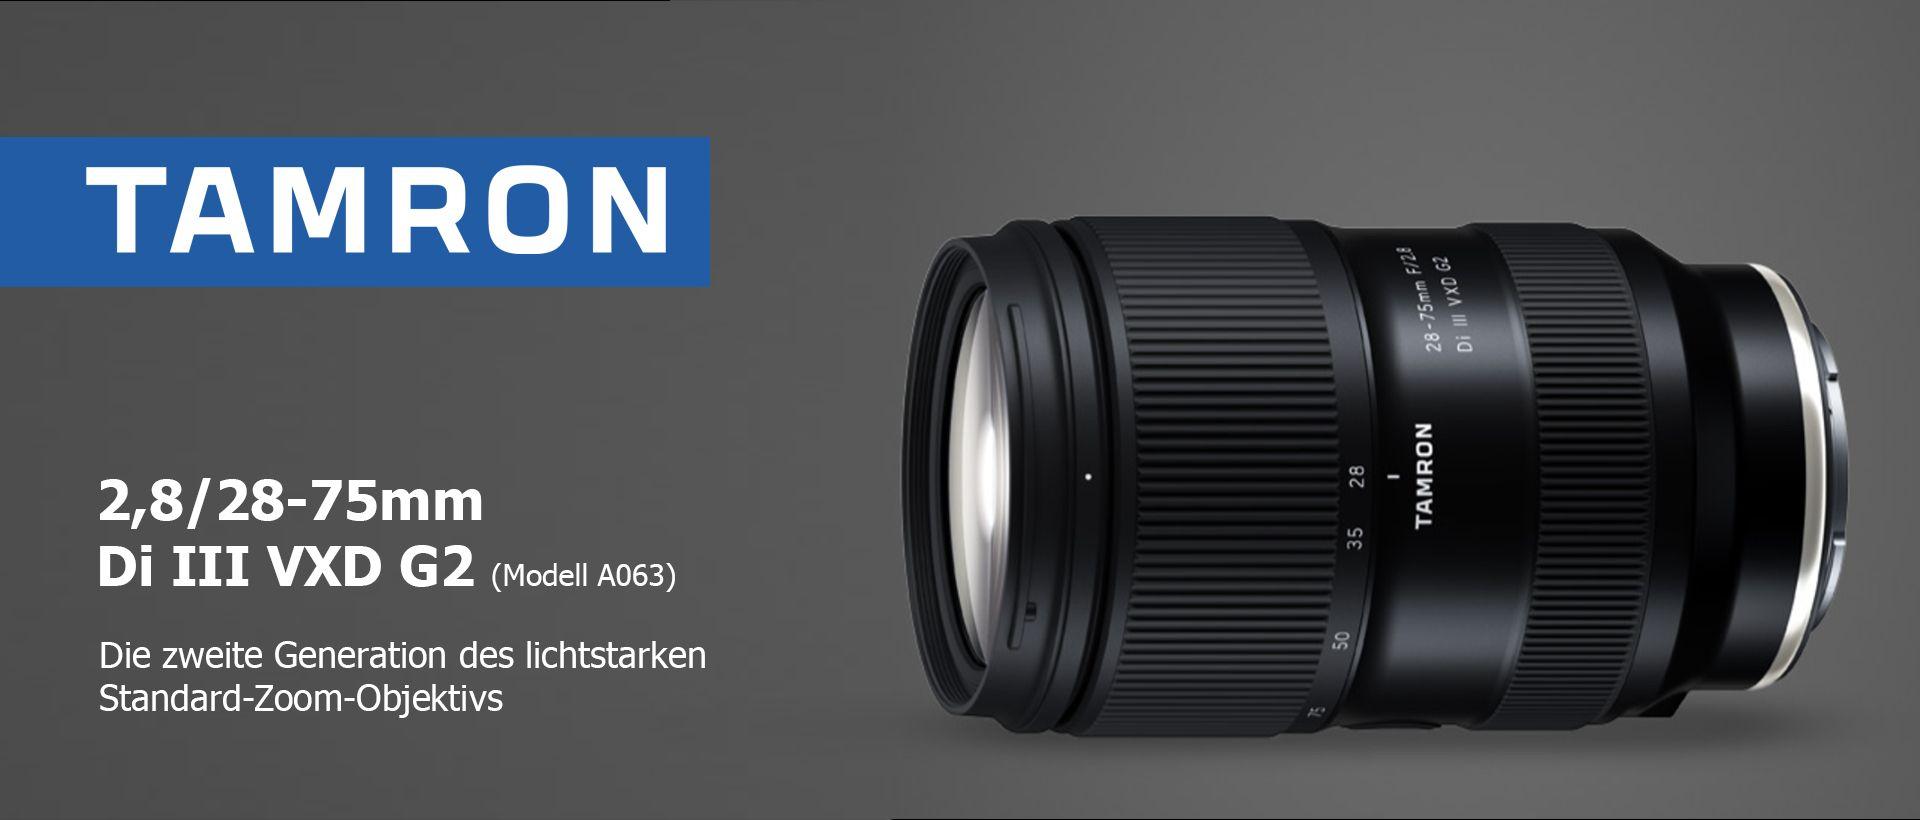 Tamron 2,8/28-75mm Di III VXD G2 (Modell A063)